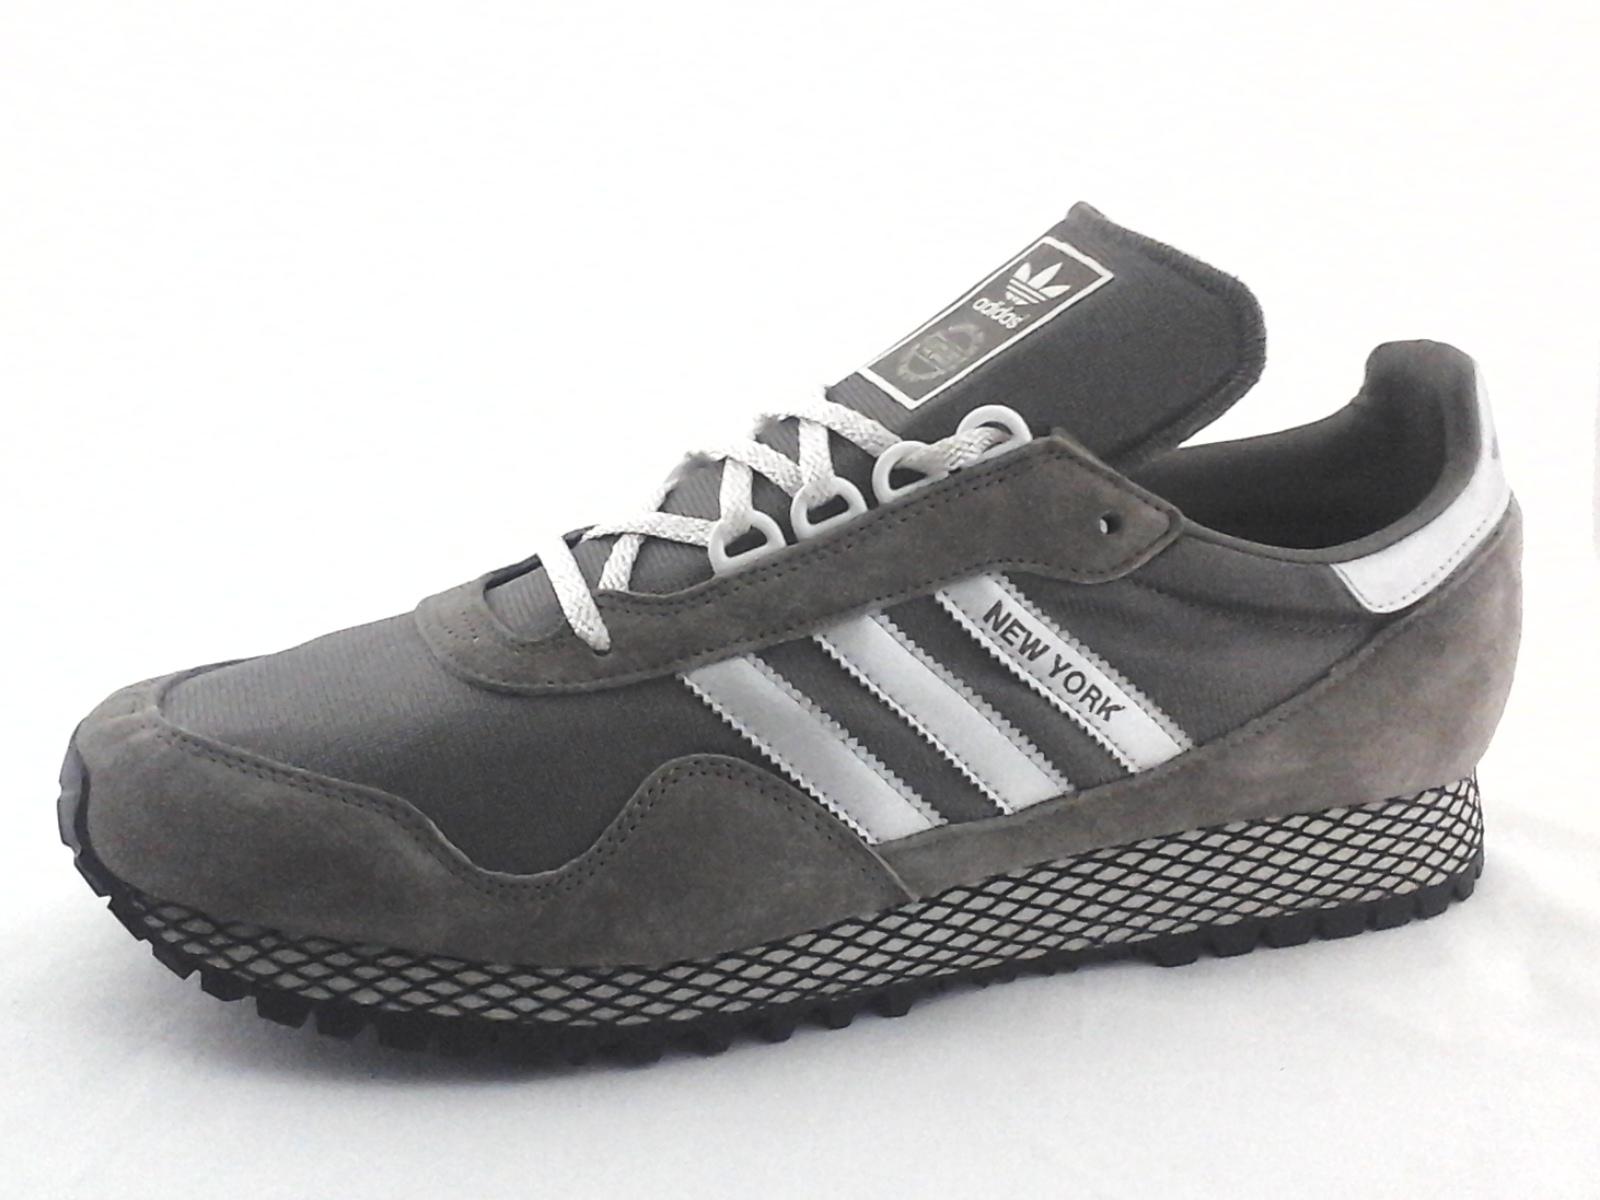 brillo perrito Lucro  Adidas NEW YORK Shoes Gray Suede Silver Metallic Retro BY9338 Mens New * |  eBay